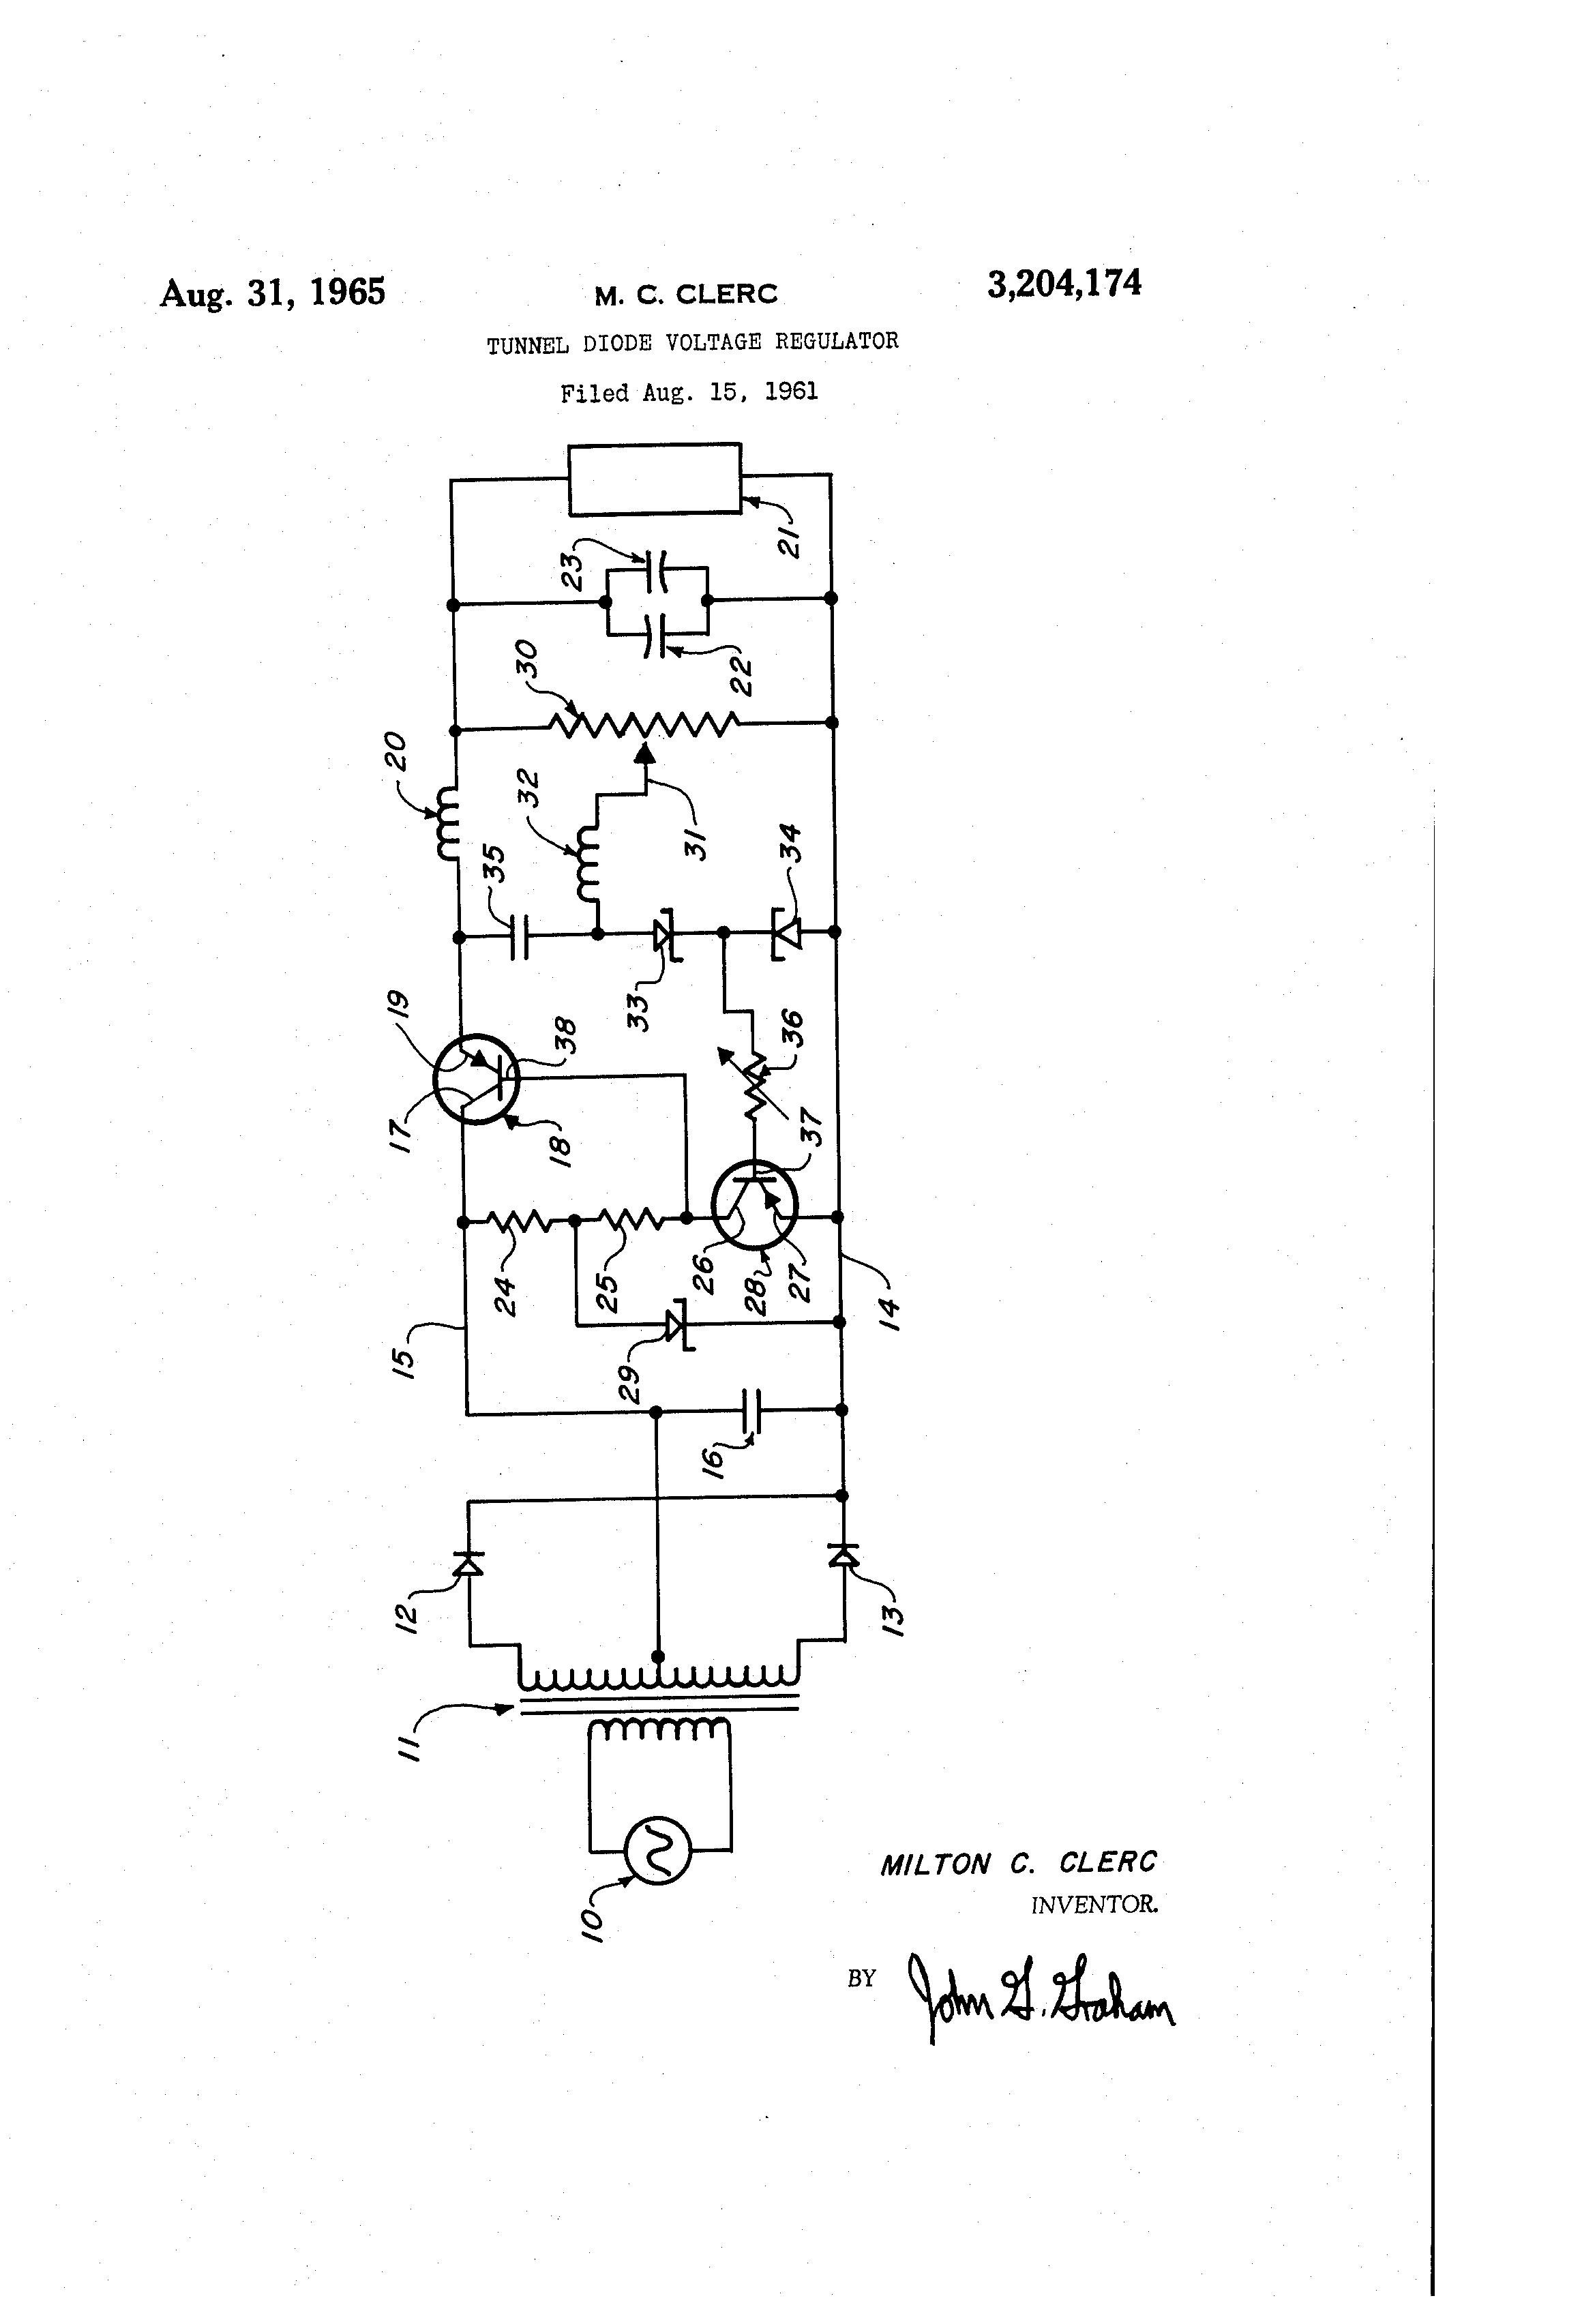 Patent Us3204174 Tunnel Diode Voltage Regulator Google Patents Circuit Diagram Zener Drawing